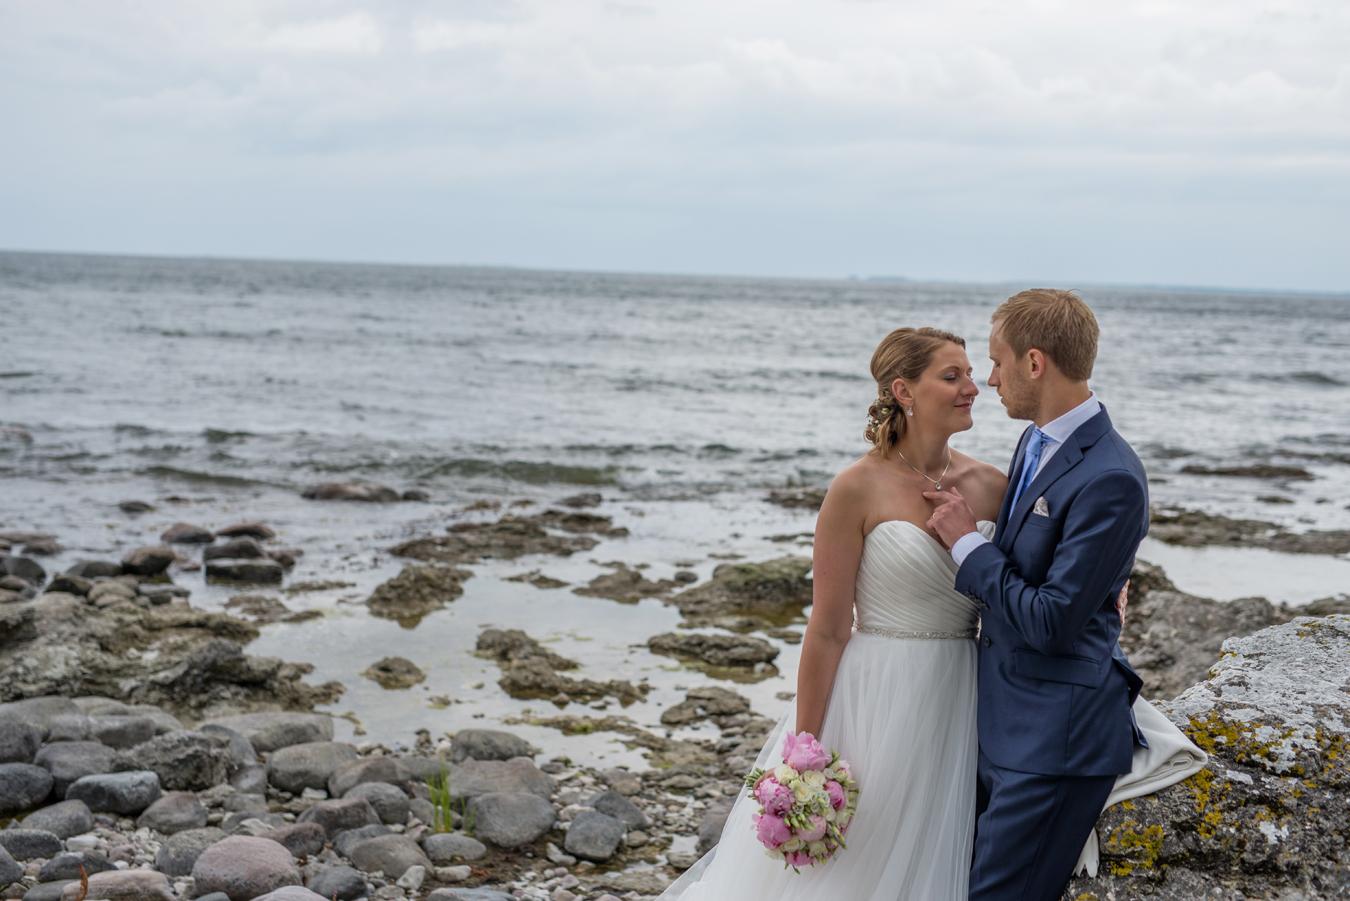 045-bröllopsfotograf-folhammar-gotland-neas-fotografi.jpg